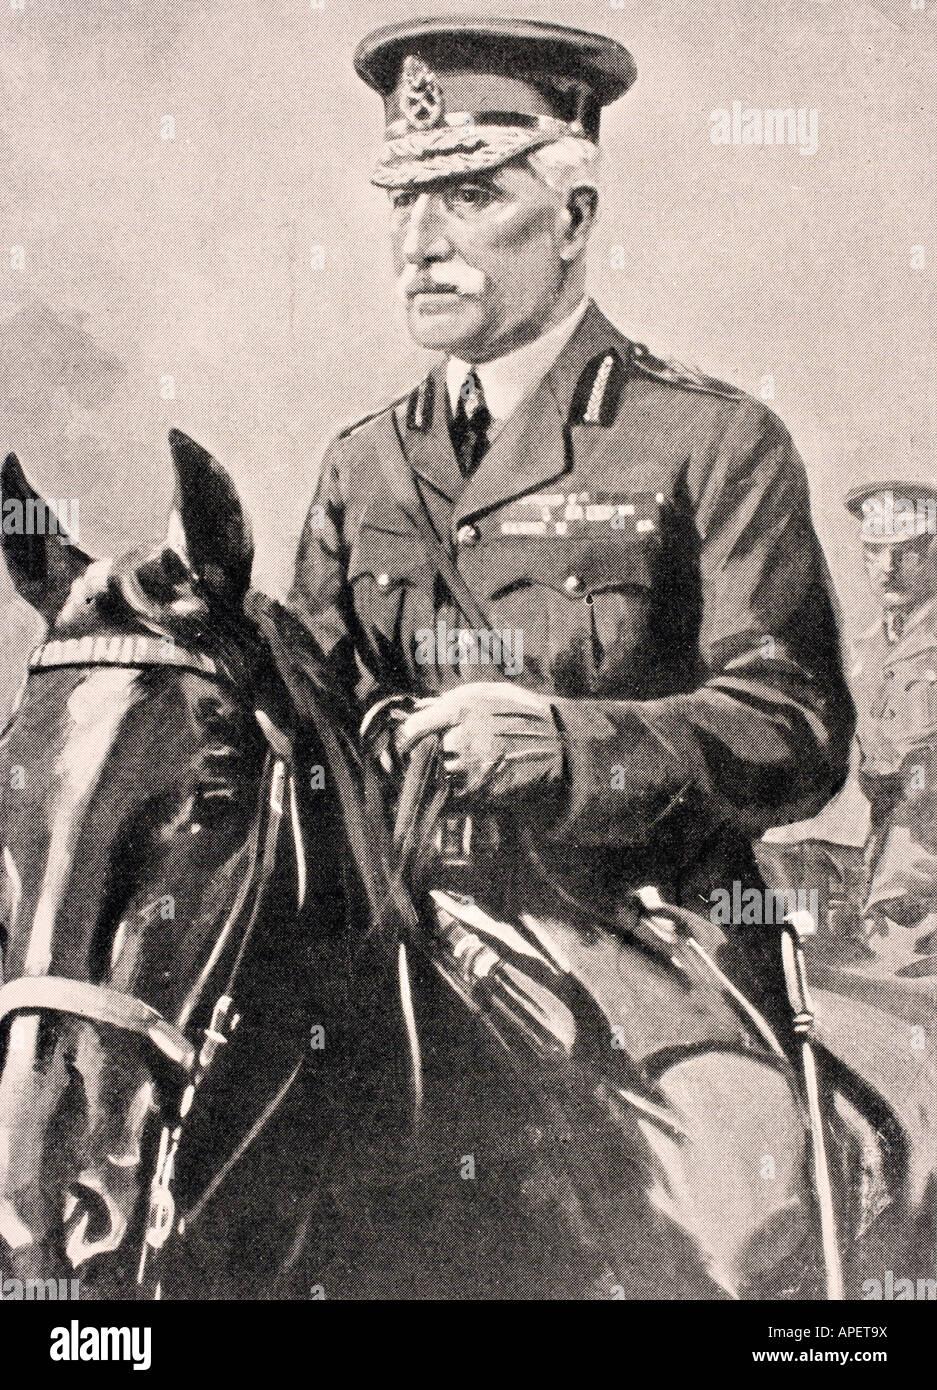 General Sir Horace Lockwood Smith Dorrien 1858 to 1930 British soldier - Stock Image